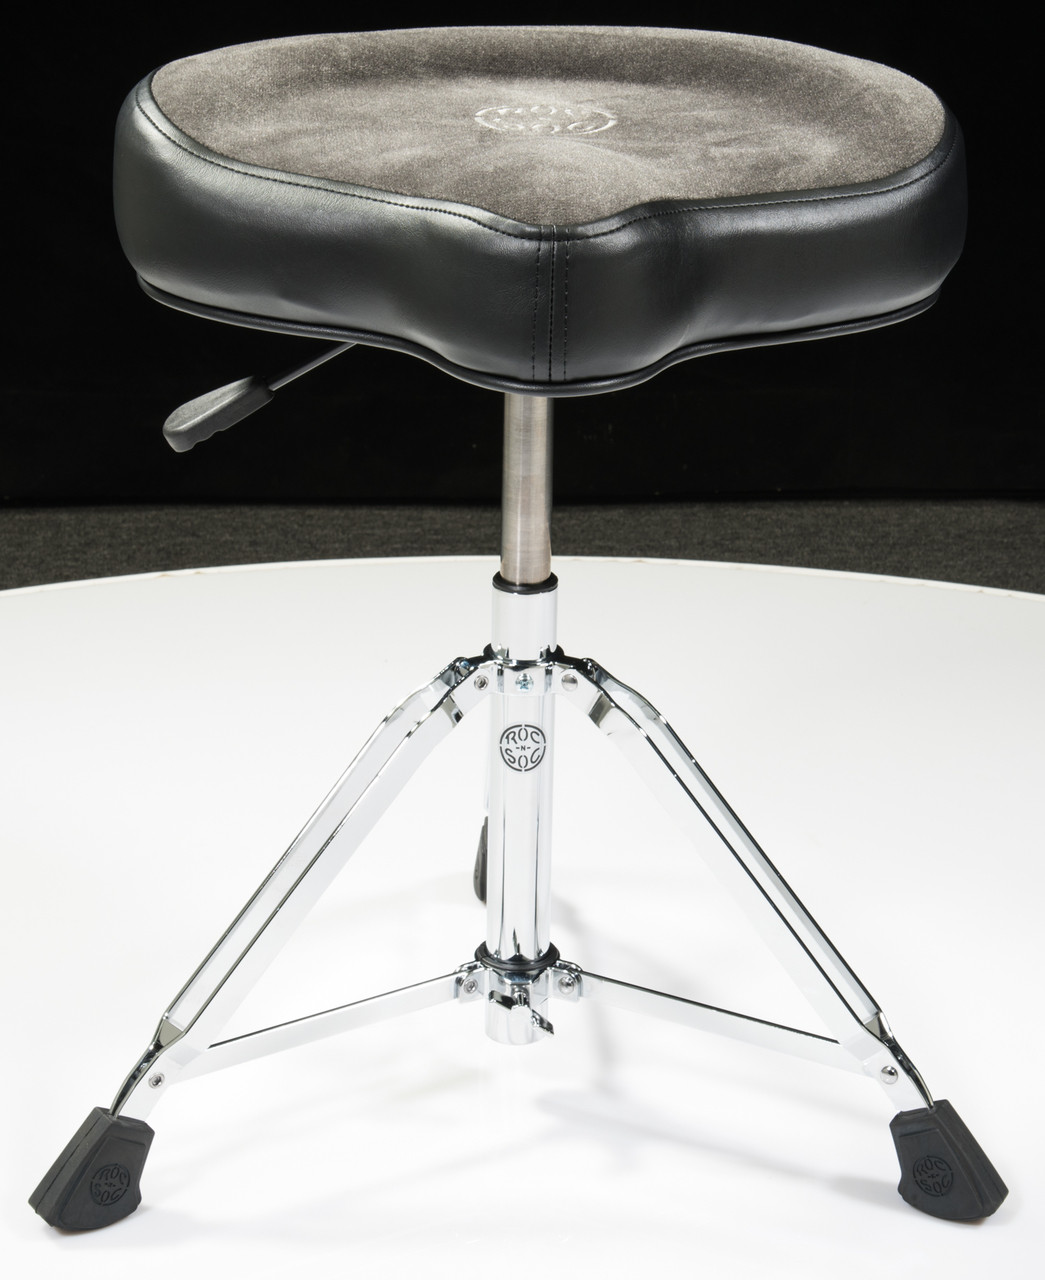 Roc-n-Soc Nitro Original Throne - Gray